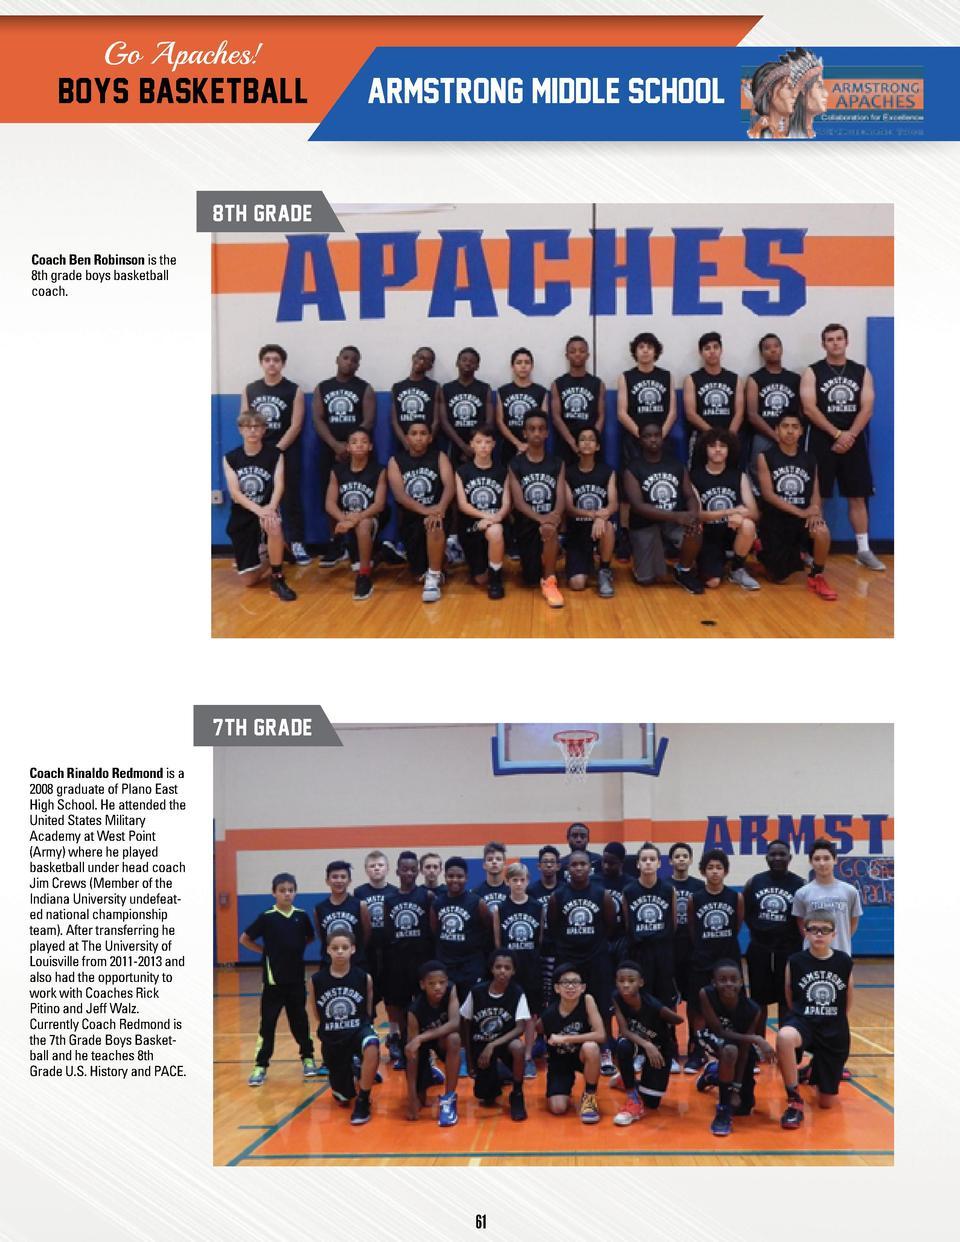 Plano East Basketball Game Progr : simplebooklet com